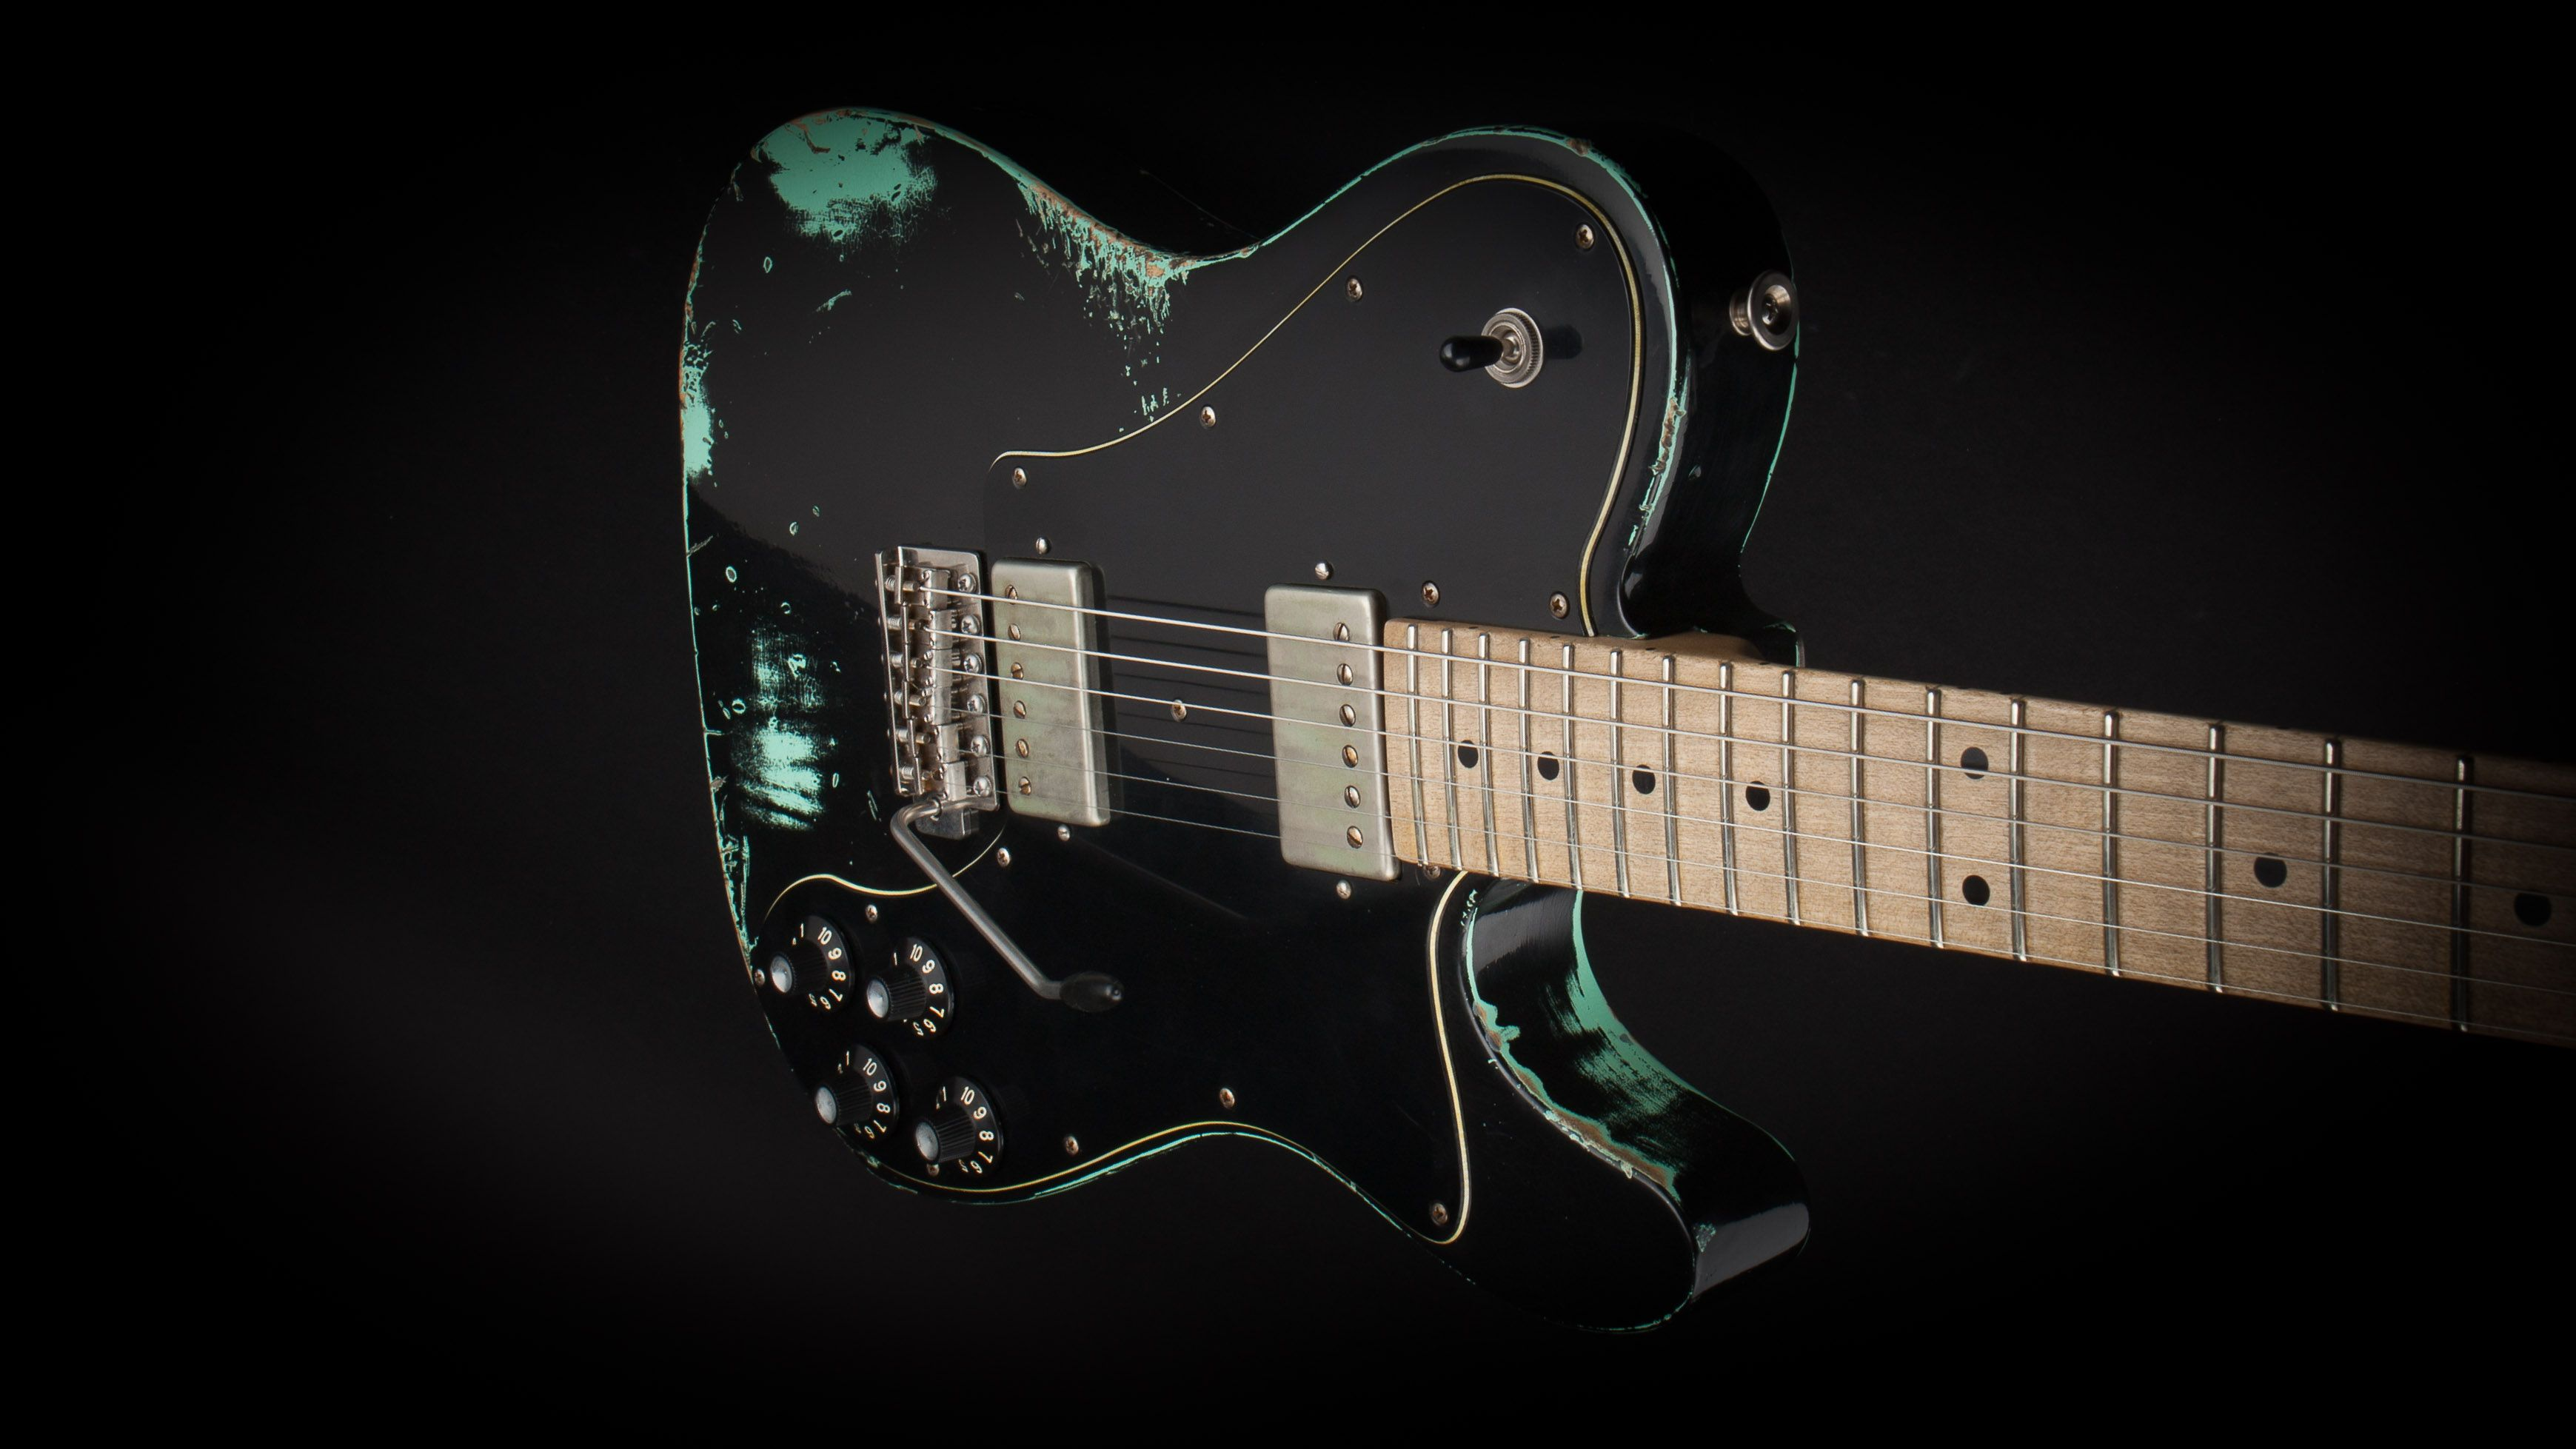 luxxtone nashville black over sea foam green 0017 luxxtone guitars california in 2019. Black Bedroom Furniture Sets. Home Design Ideas